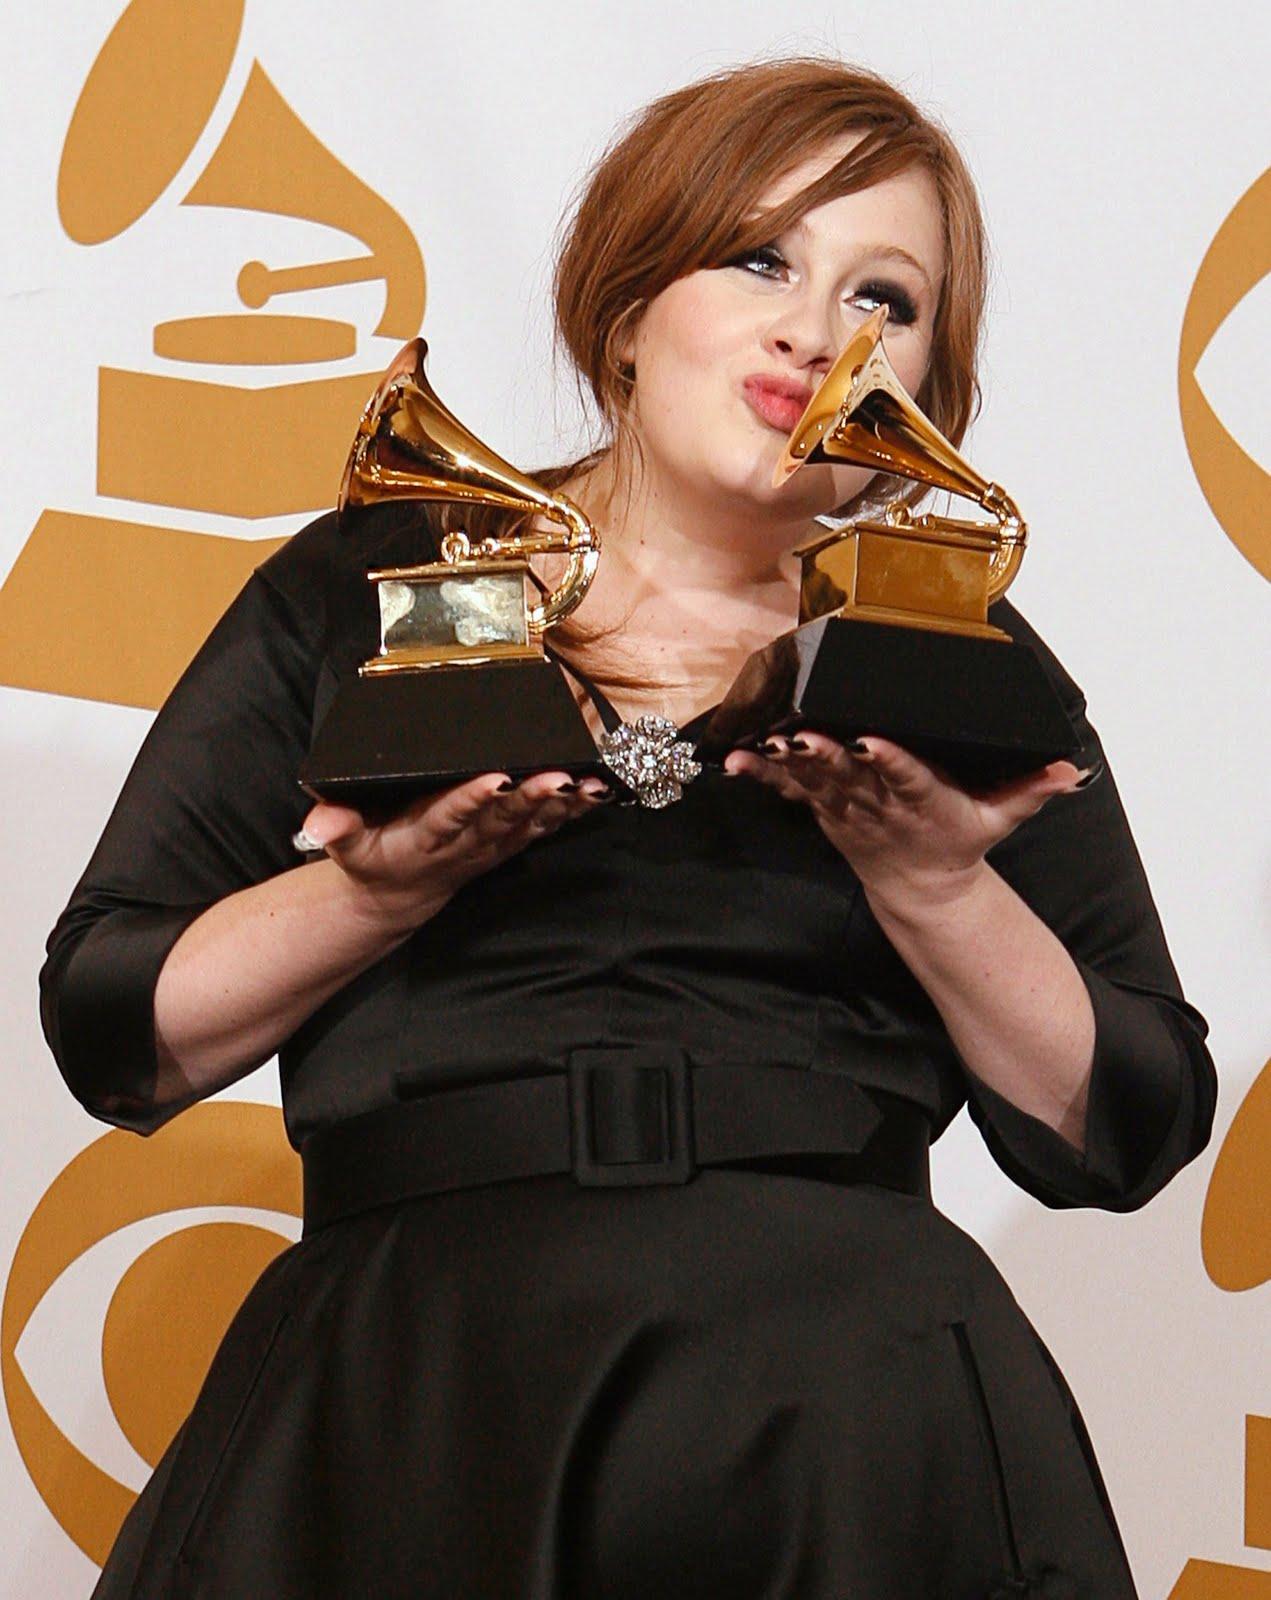 http://2.bp.blogspot.com/-XZpxrQpNMrg/TovofcWH0sI/AAAAAAAAFek/XOhkZC1vAIA/s1600/adele_awards.jpeg